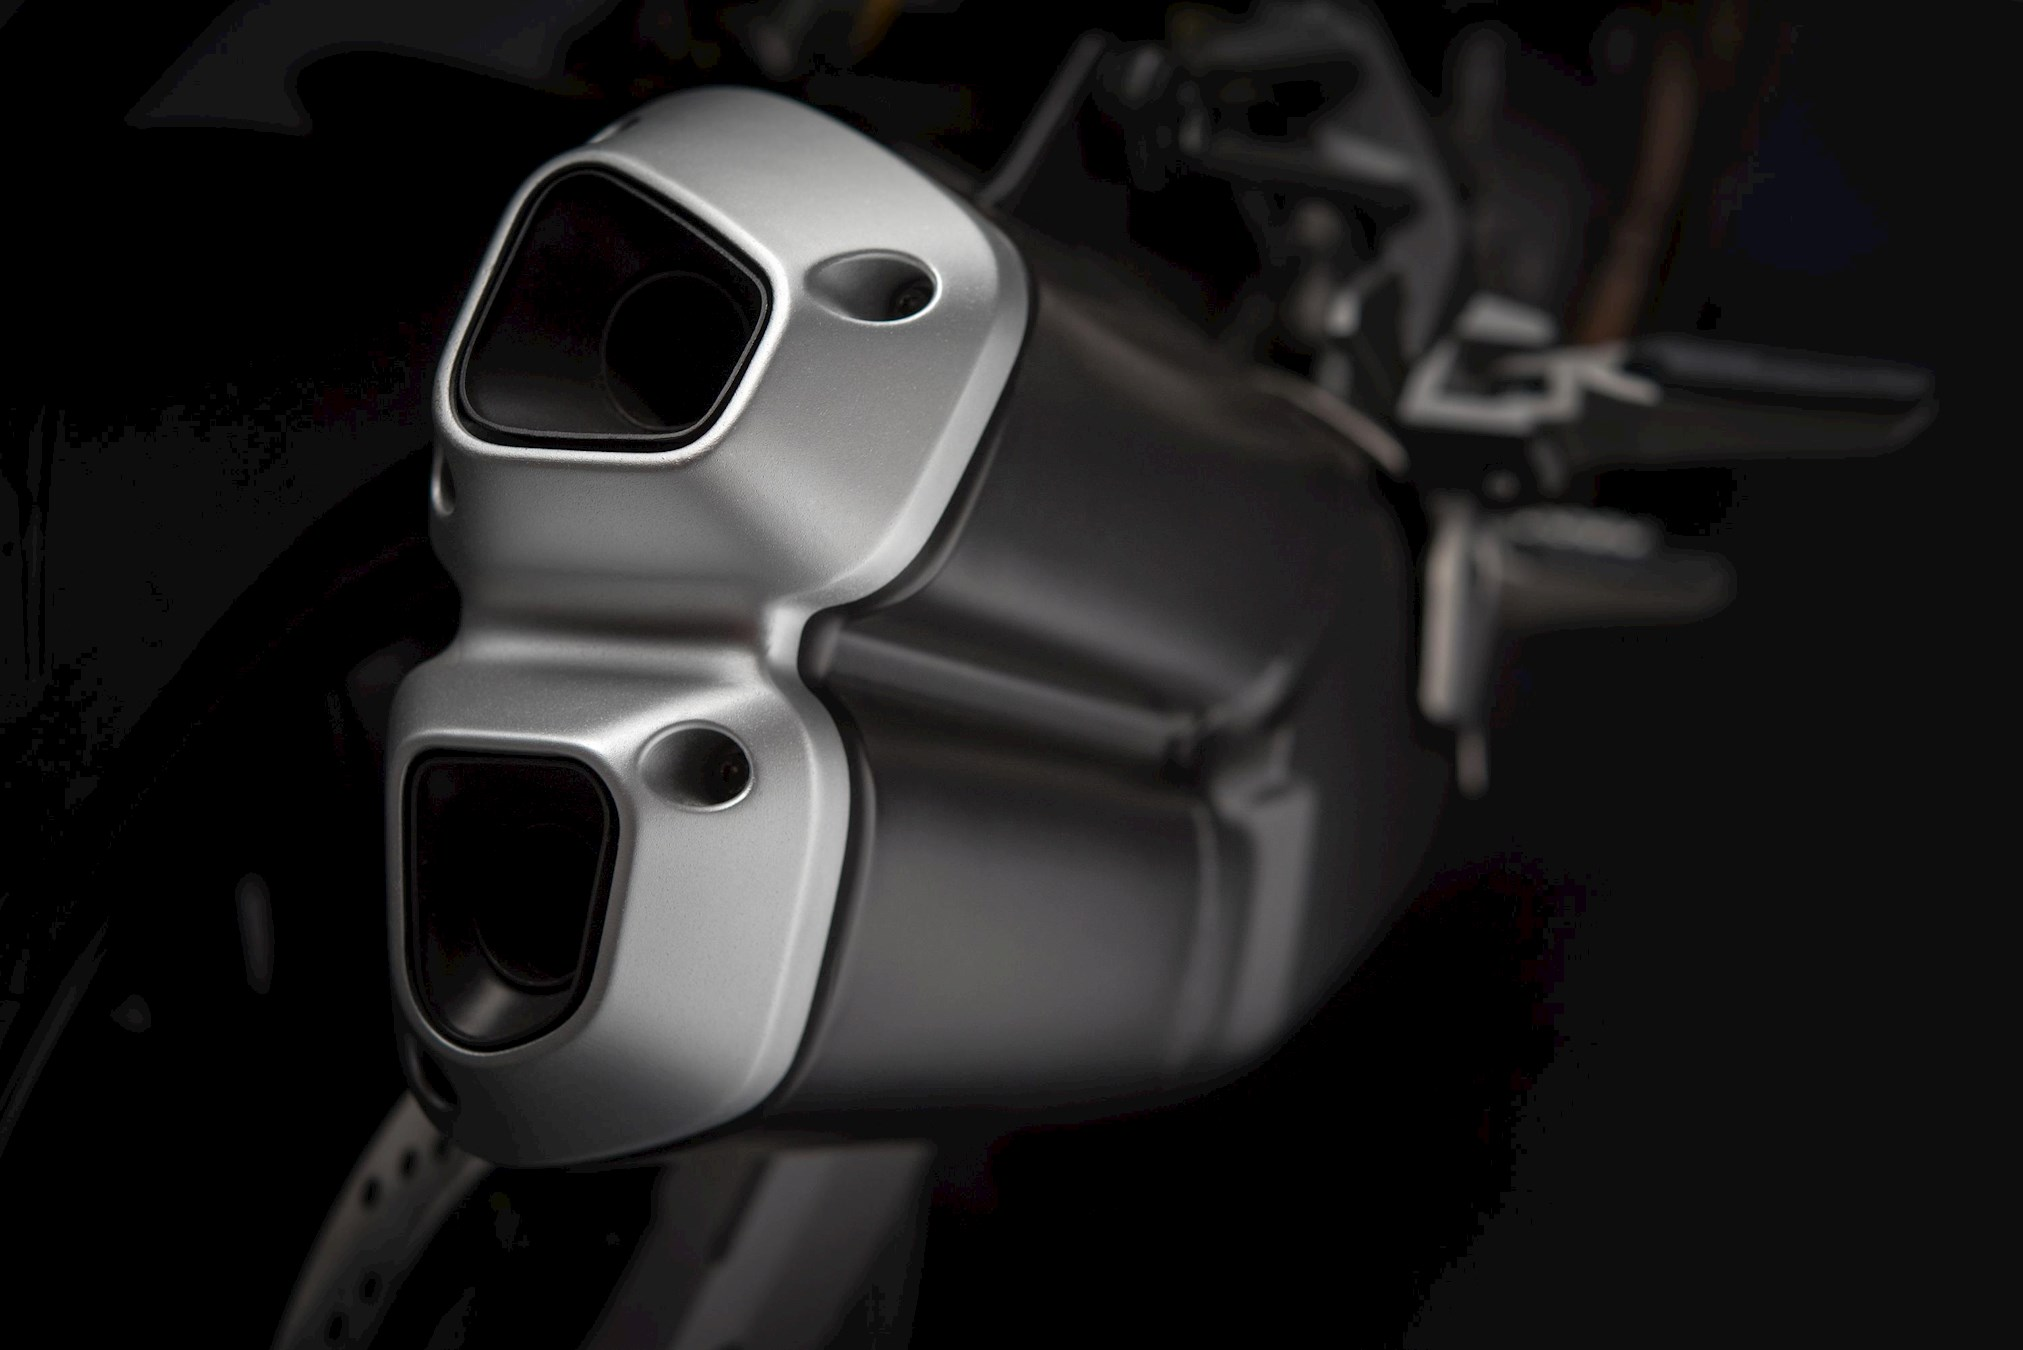 МОТОЦИКЛ DUCATI MONSTER 821 Stealth  Артмото - купить квадроцикл в украине и харькове, мотоцикл, снегоход, скутер, мопед, электромобиль